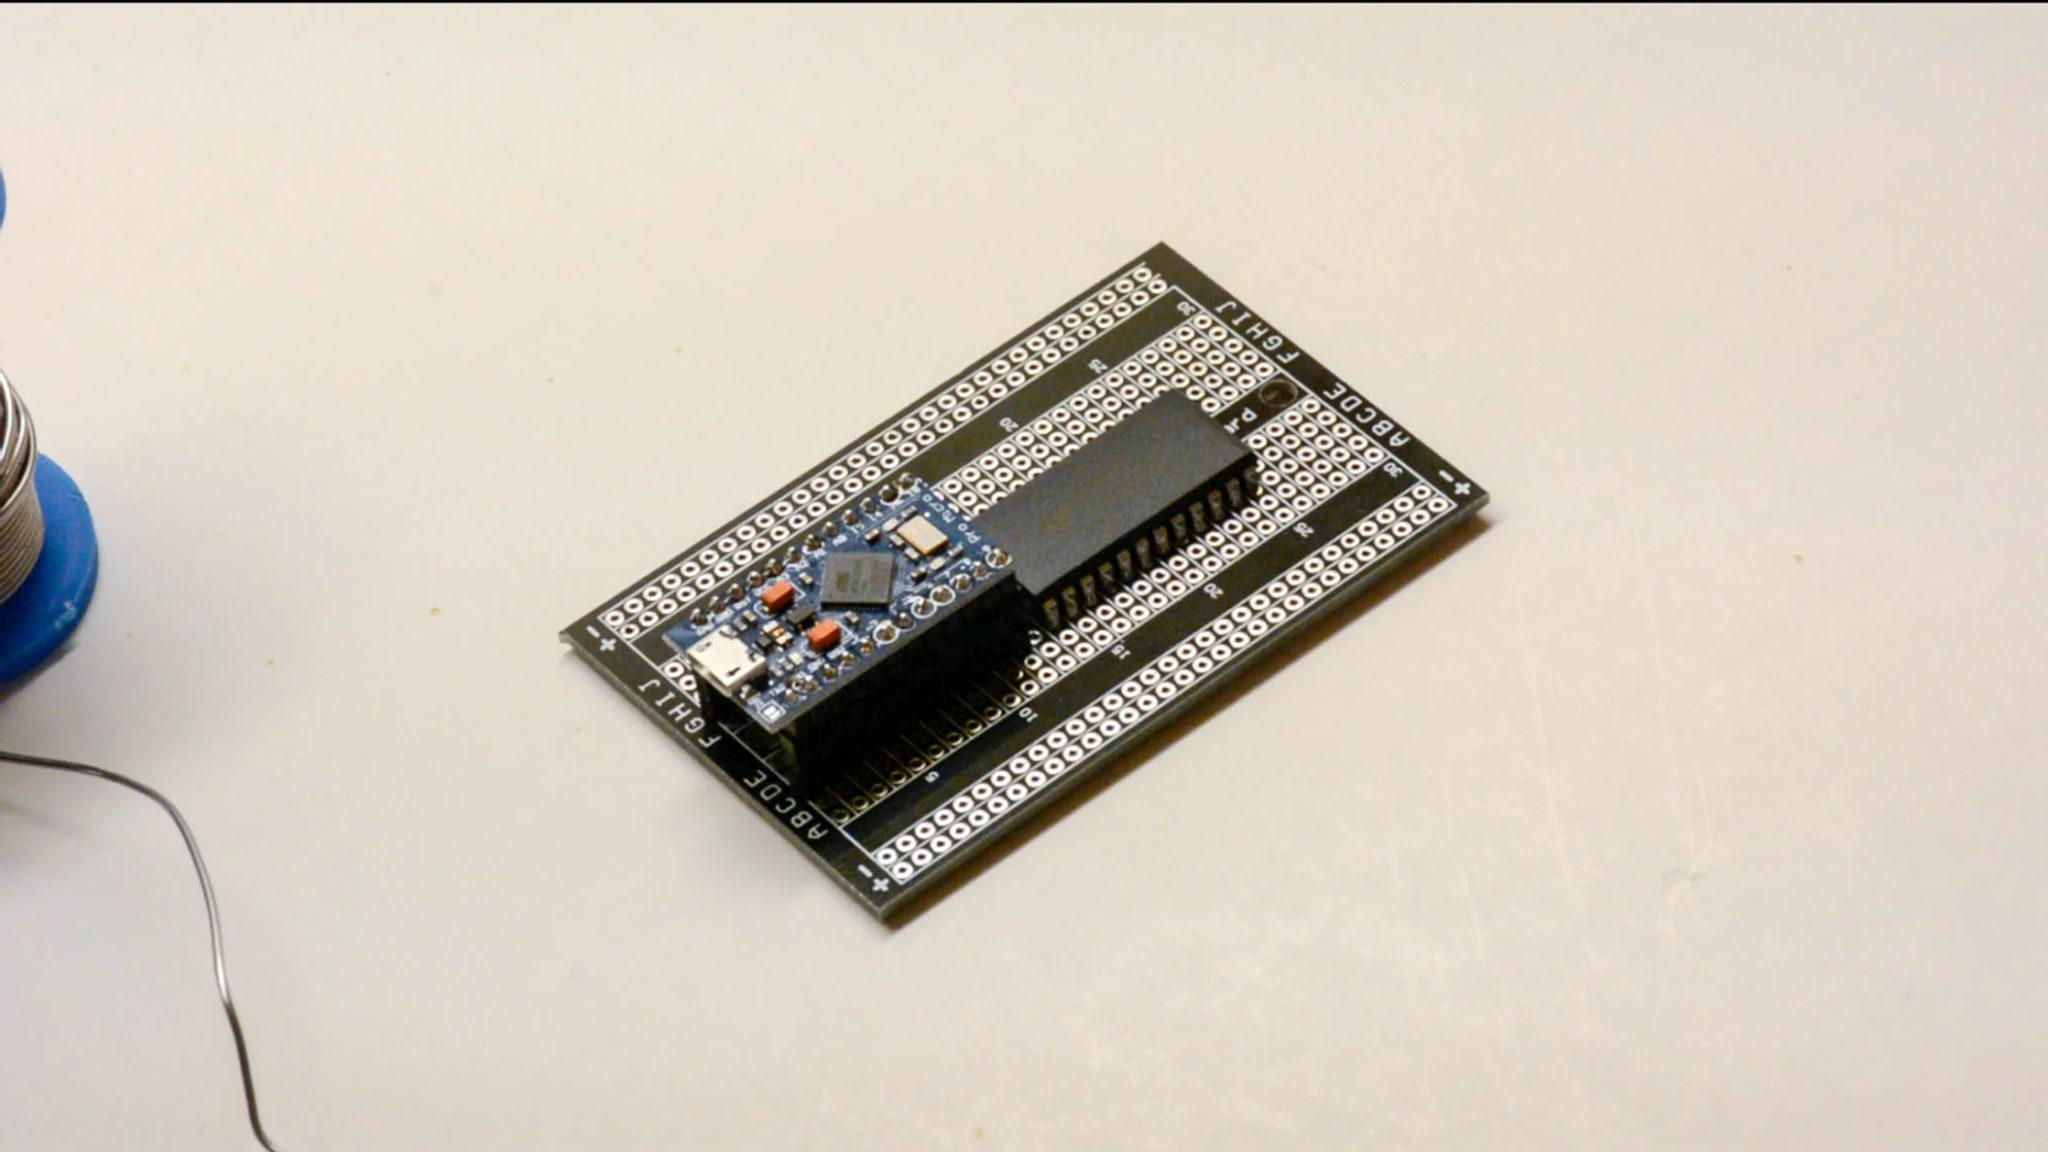 05-solder-the-cd4067